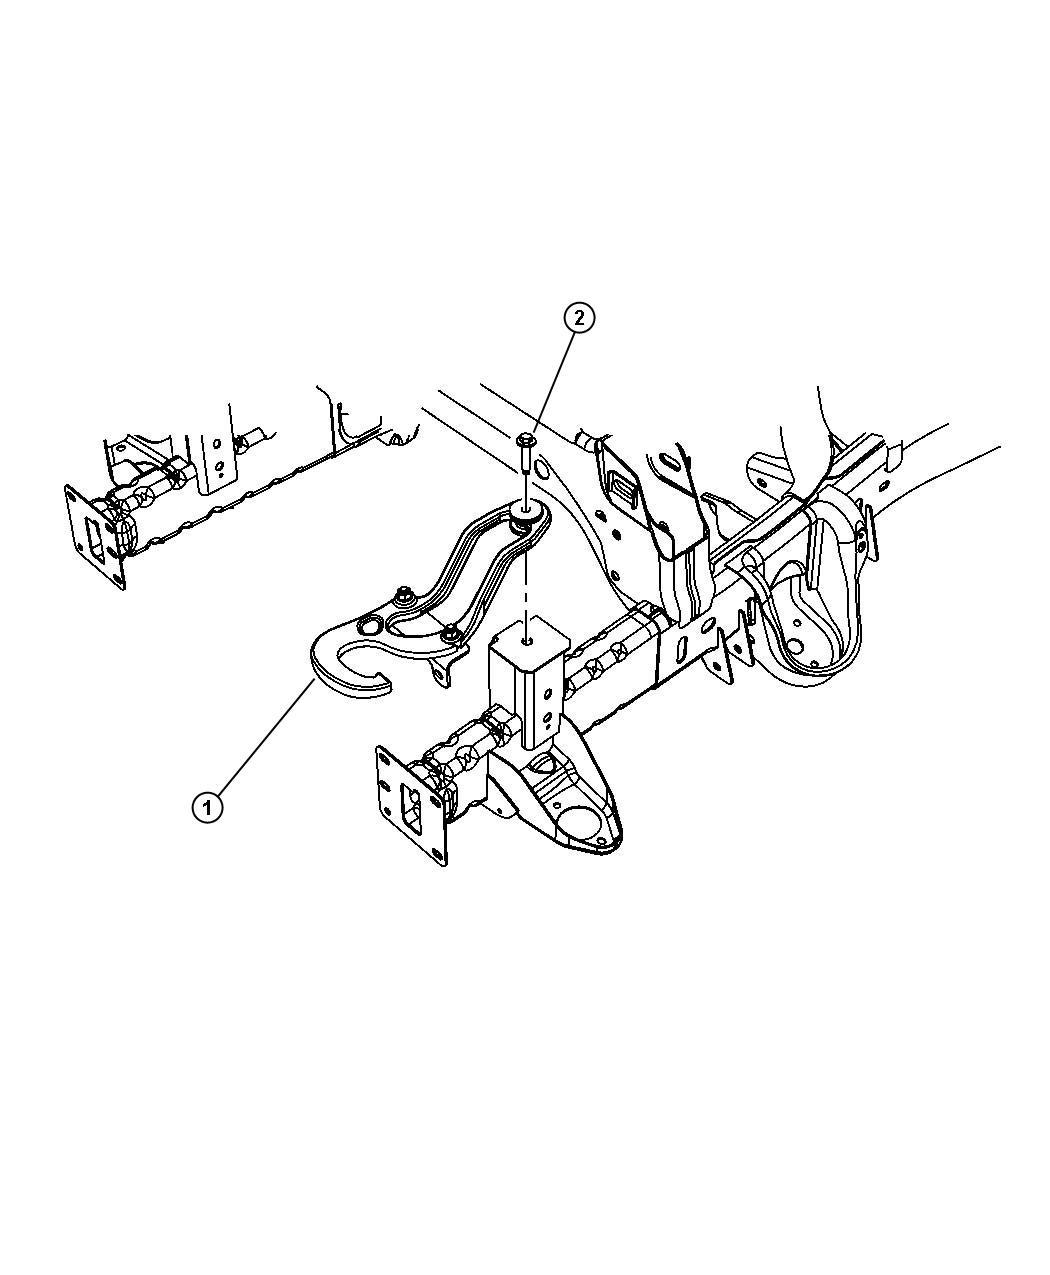 2012 Dodge Ram 1500 Hook  Tow  Left   Tow Hooks    Add Tow